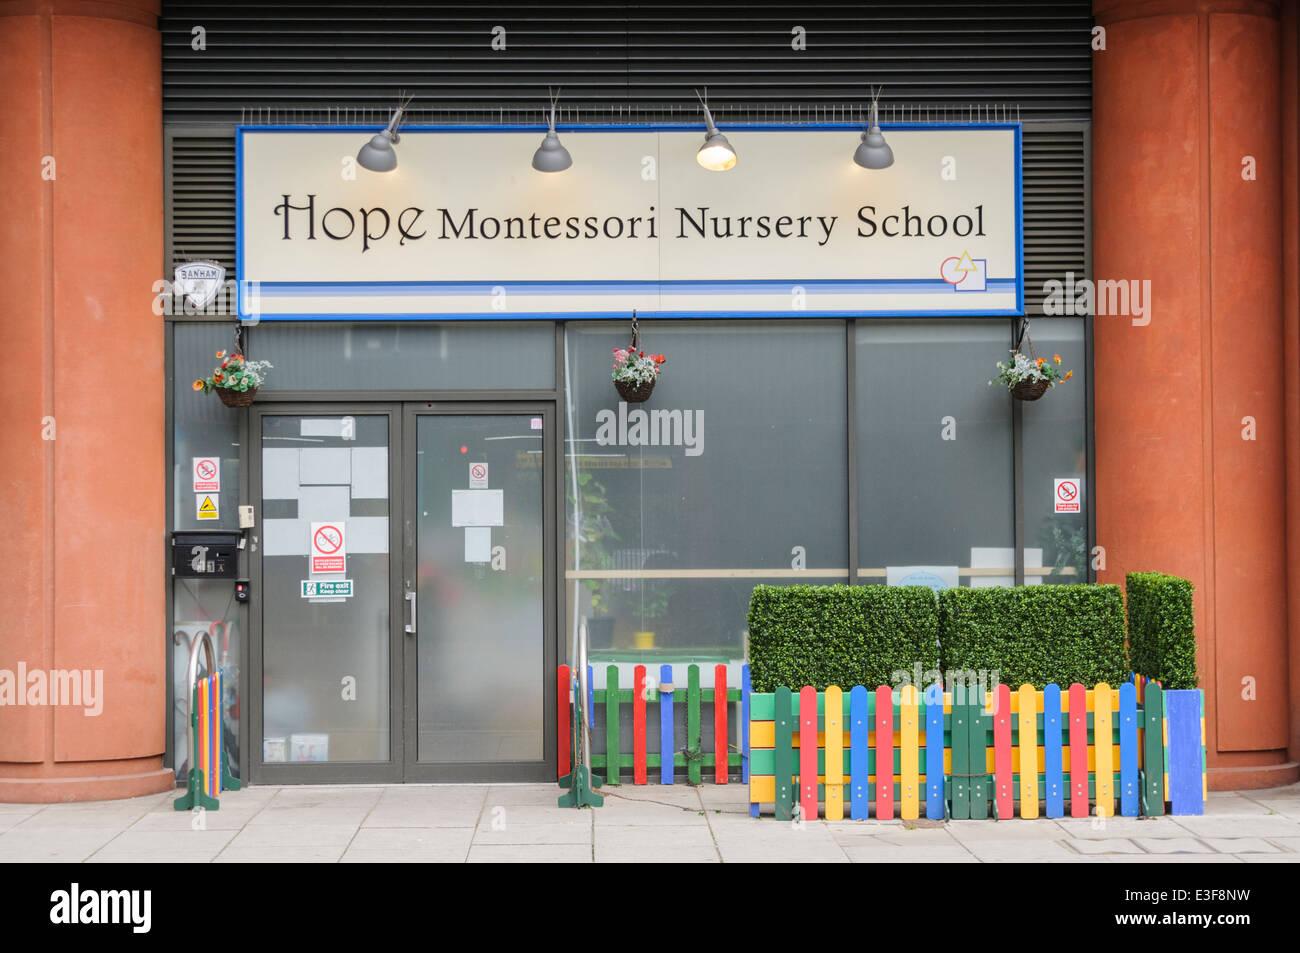 Hope Montessori Kindergarten, London Stockfoto